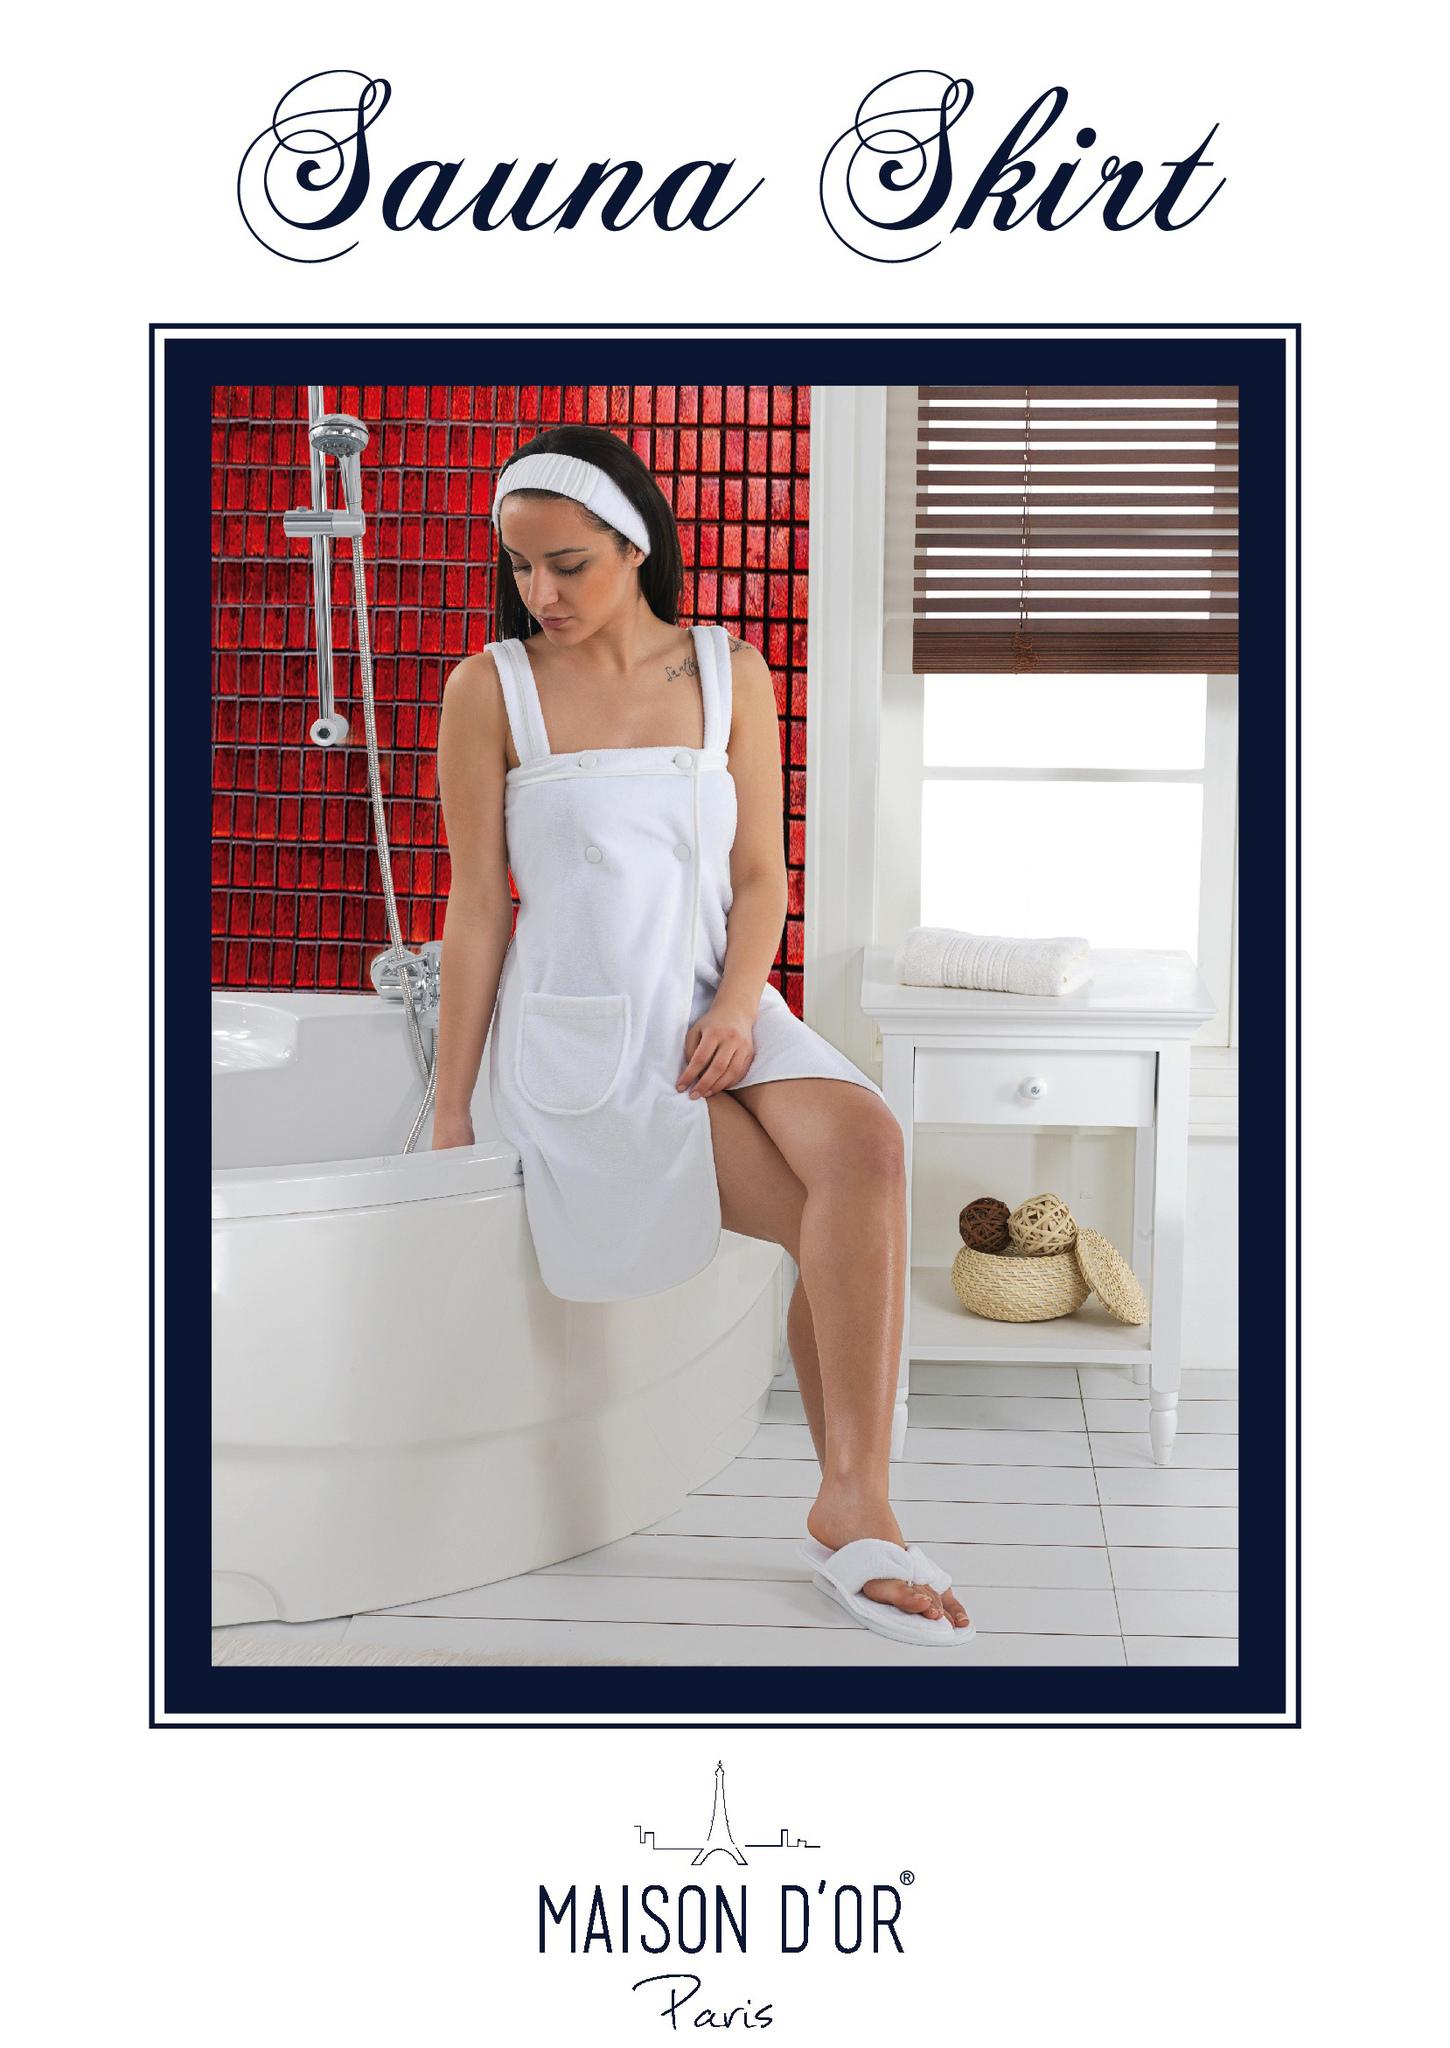 Наборы для Сауны SKIRT СКИРТ набор женский для сауны Maison Dor Турция Sauna_Skirt-K.jpg